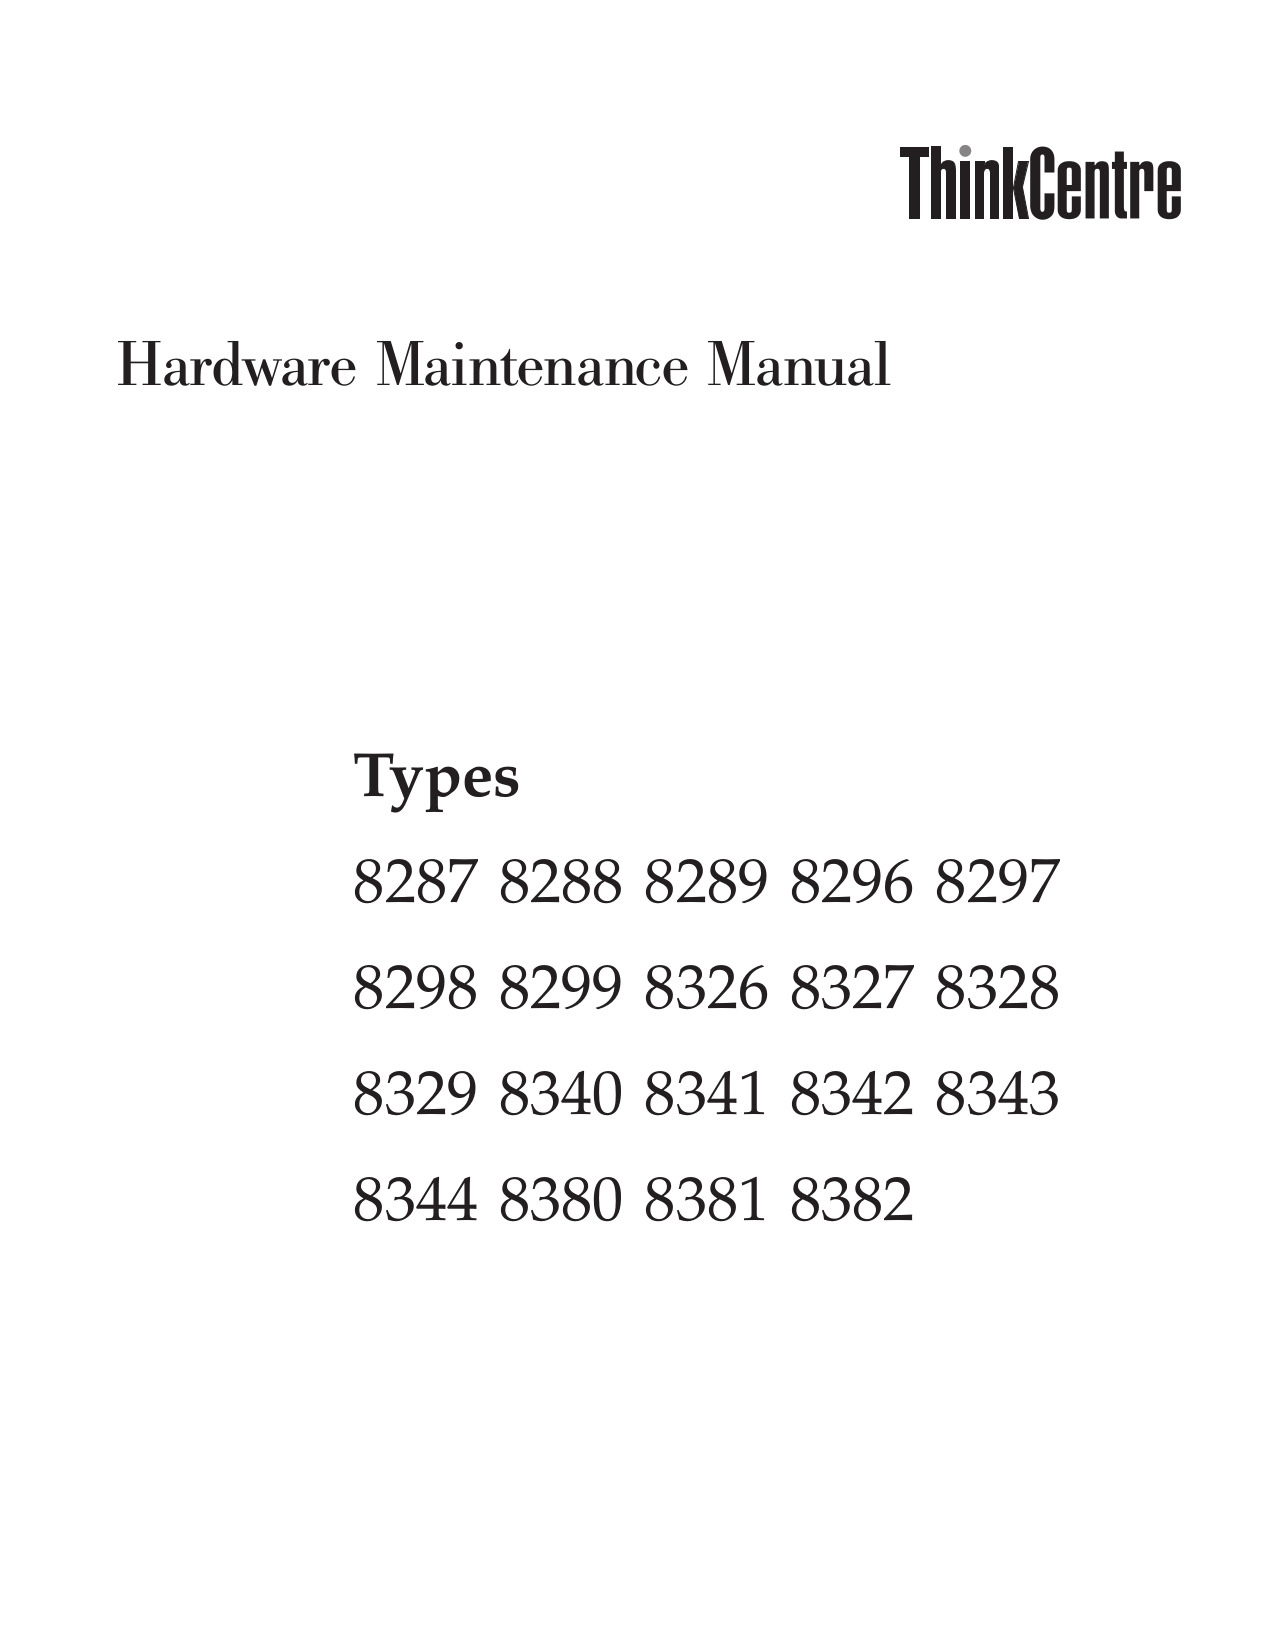 pdf for Lenovo Desktop ThinkCentre A52 8298 manual